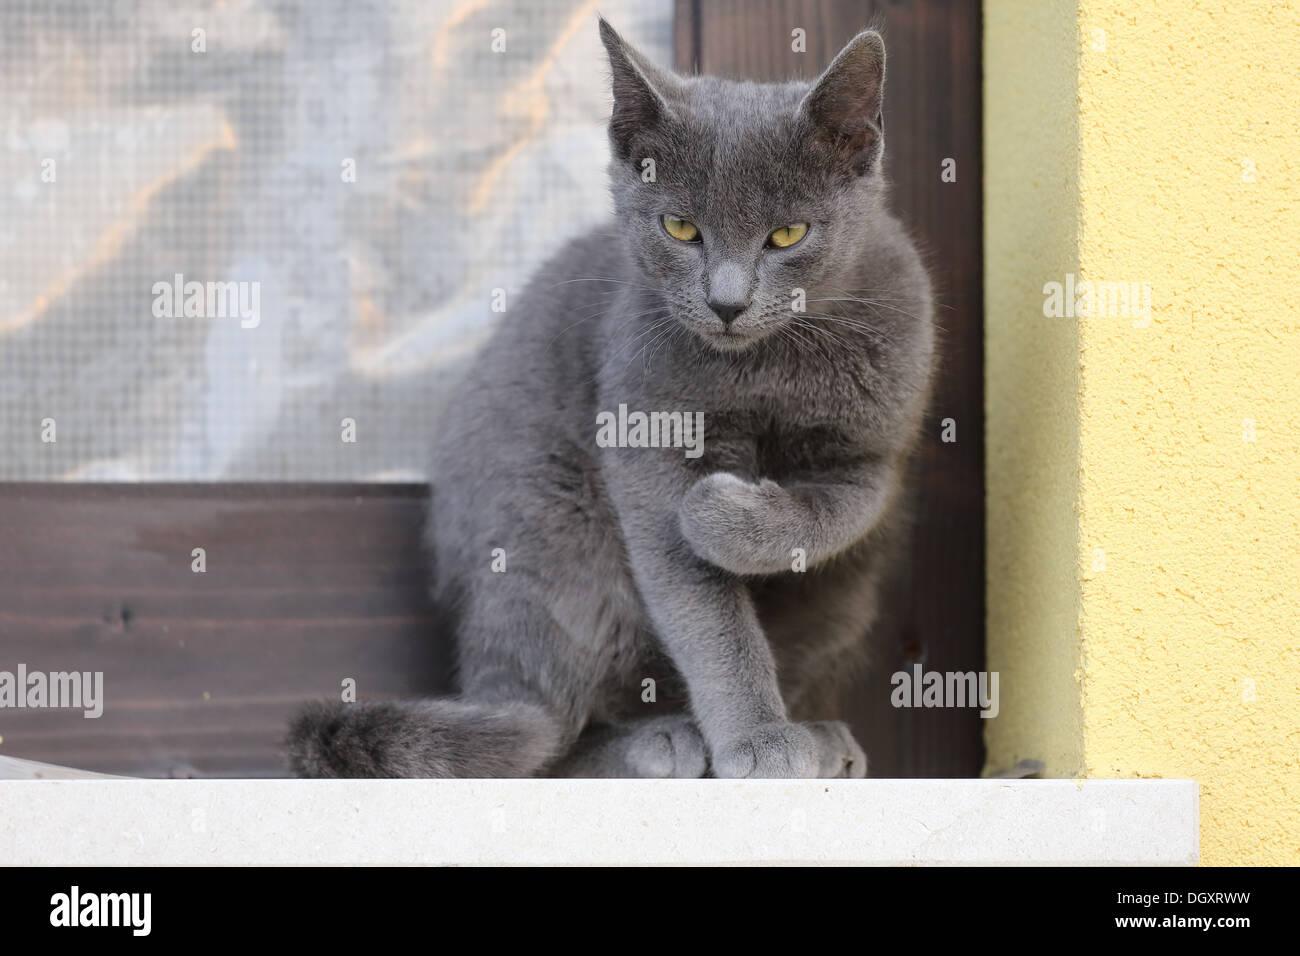 cat with attitude threatening - Stock Image